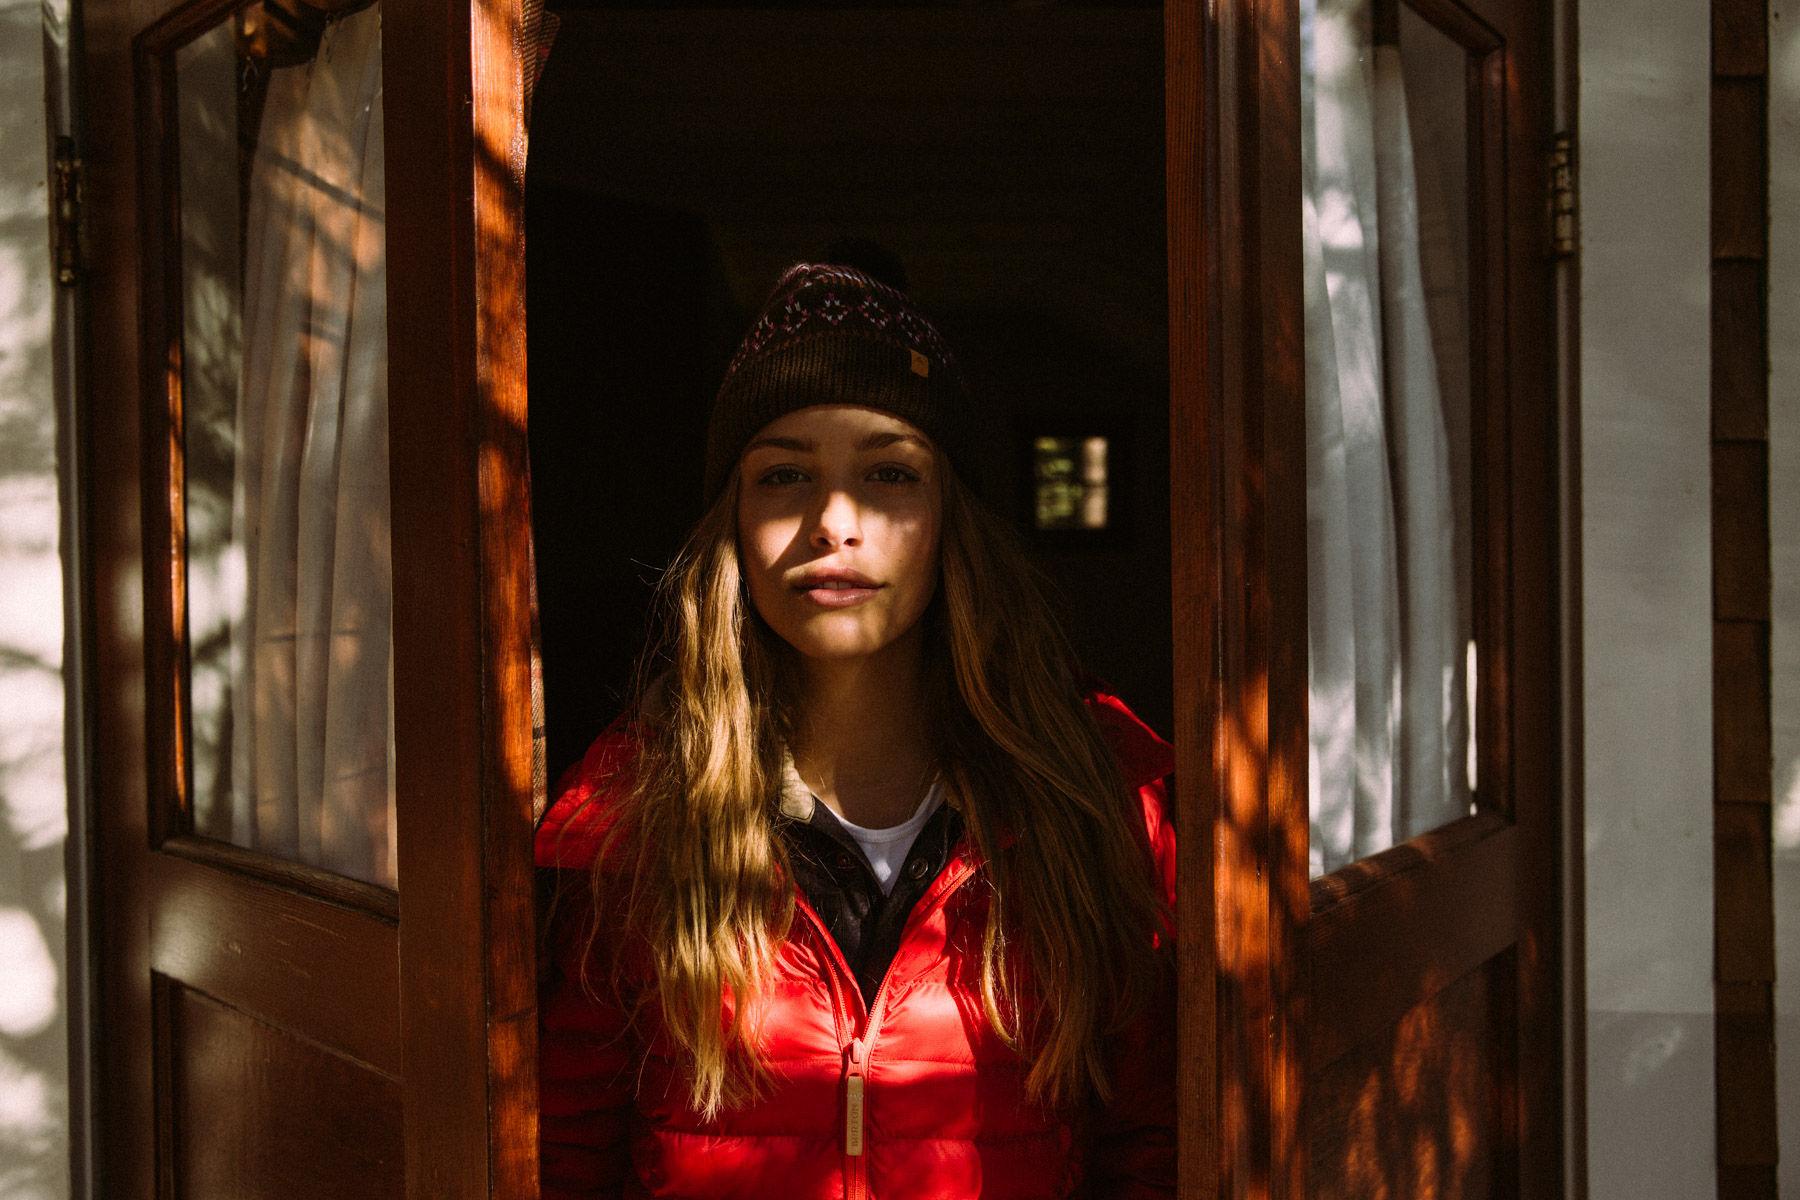 Melrose Boyer, Shadow play, Banff